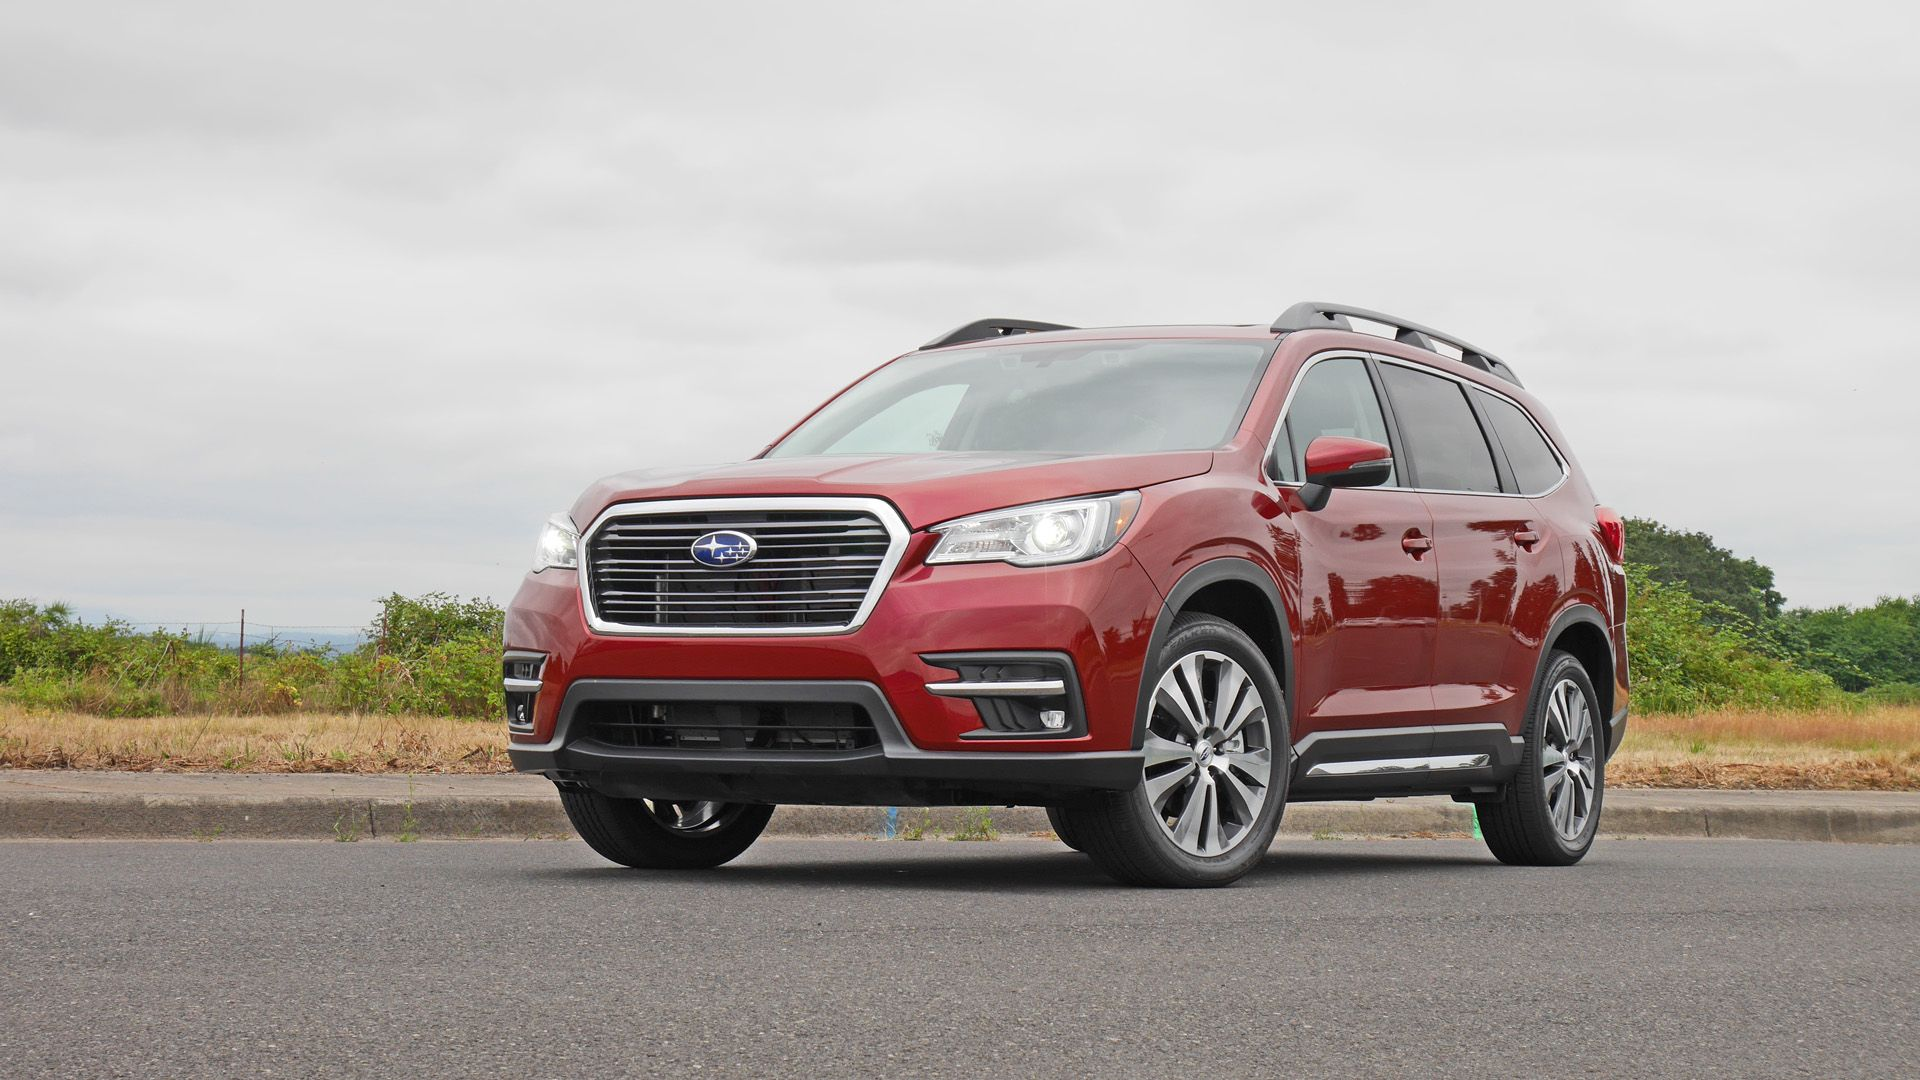 2020 Subaru Ascent Reviews Price Specs Features And Photos In 2020 Subaru Subaru Cars Car Bag